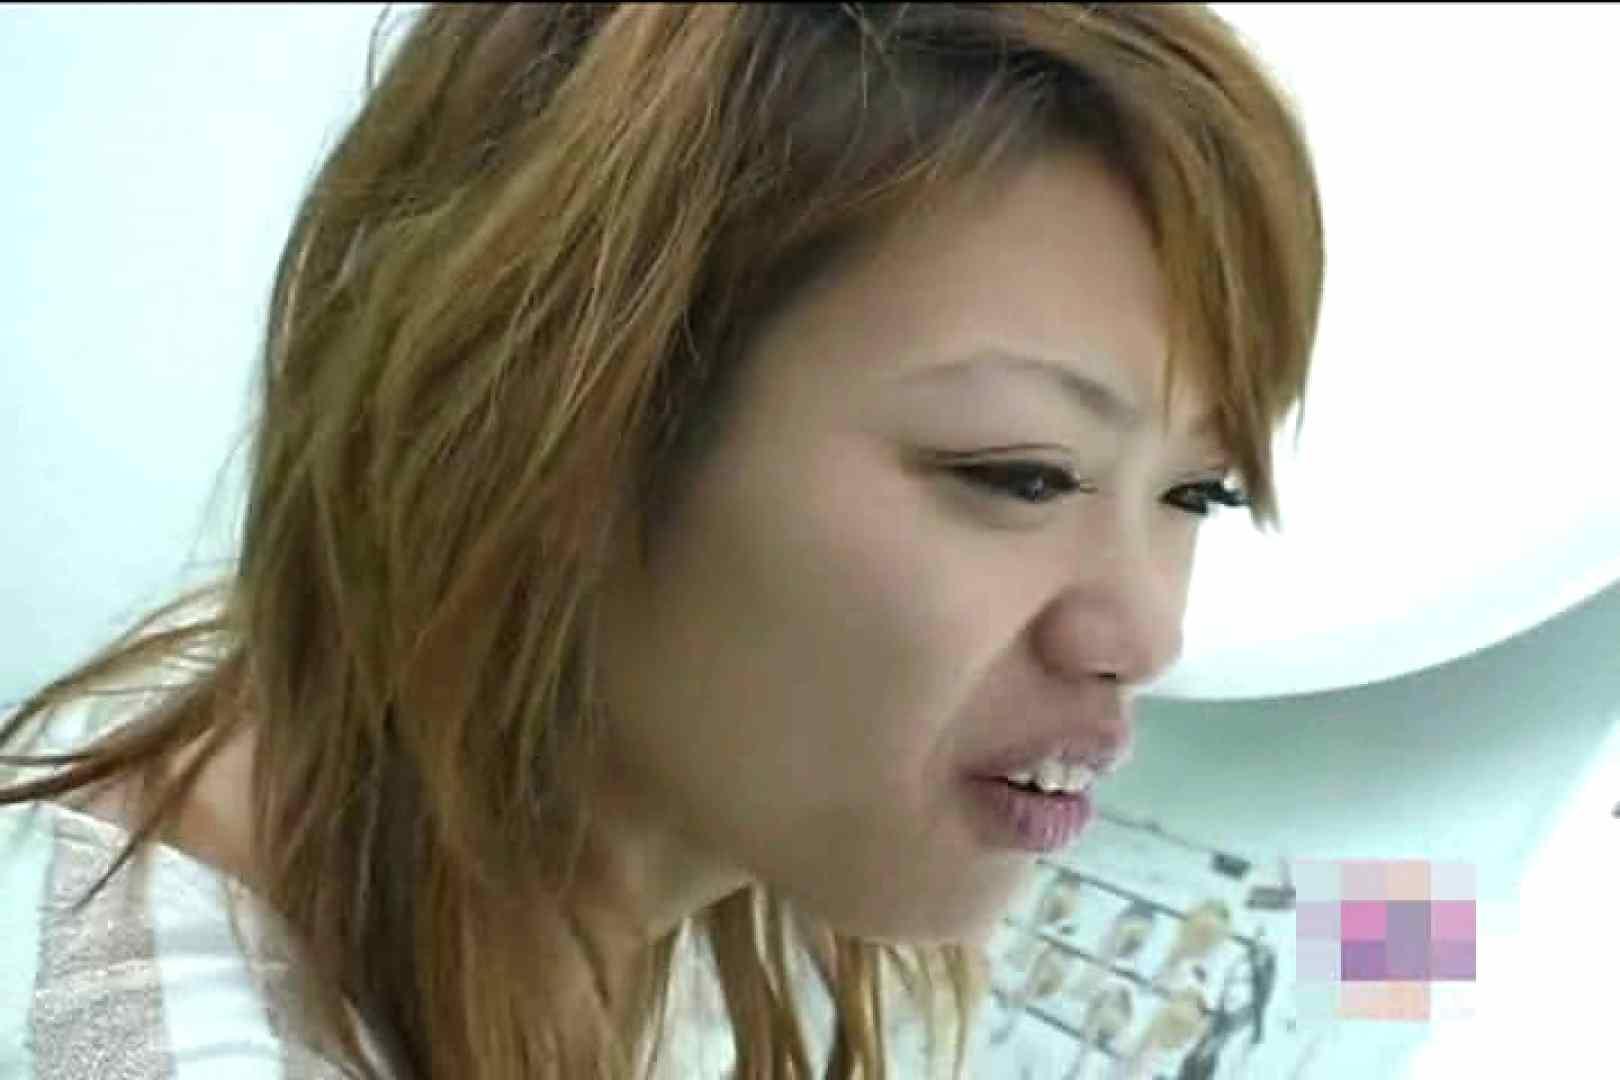 大胆露出胸チラギャル大量発生中!!Vol.6 乳首 女性器鑑賞 105画像 58